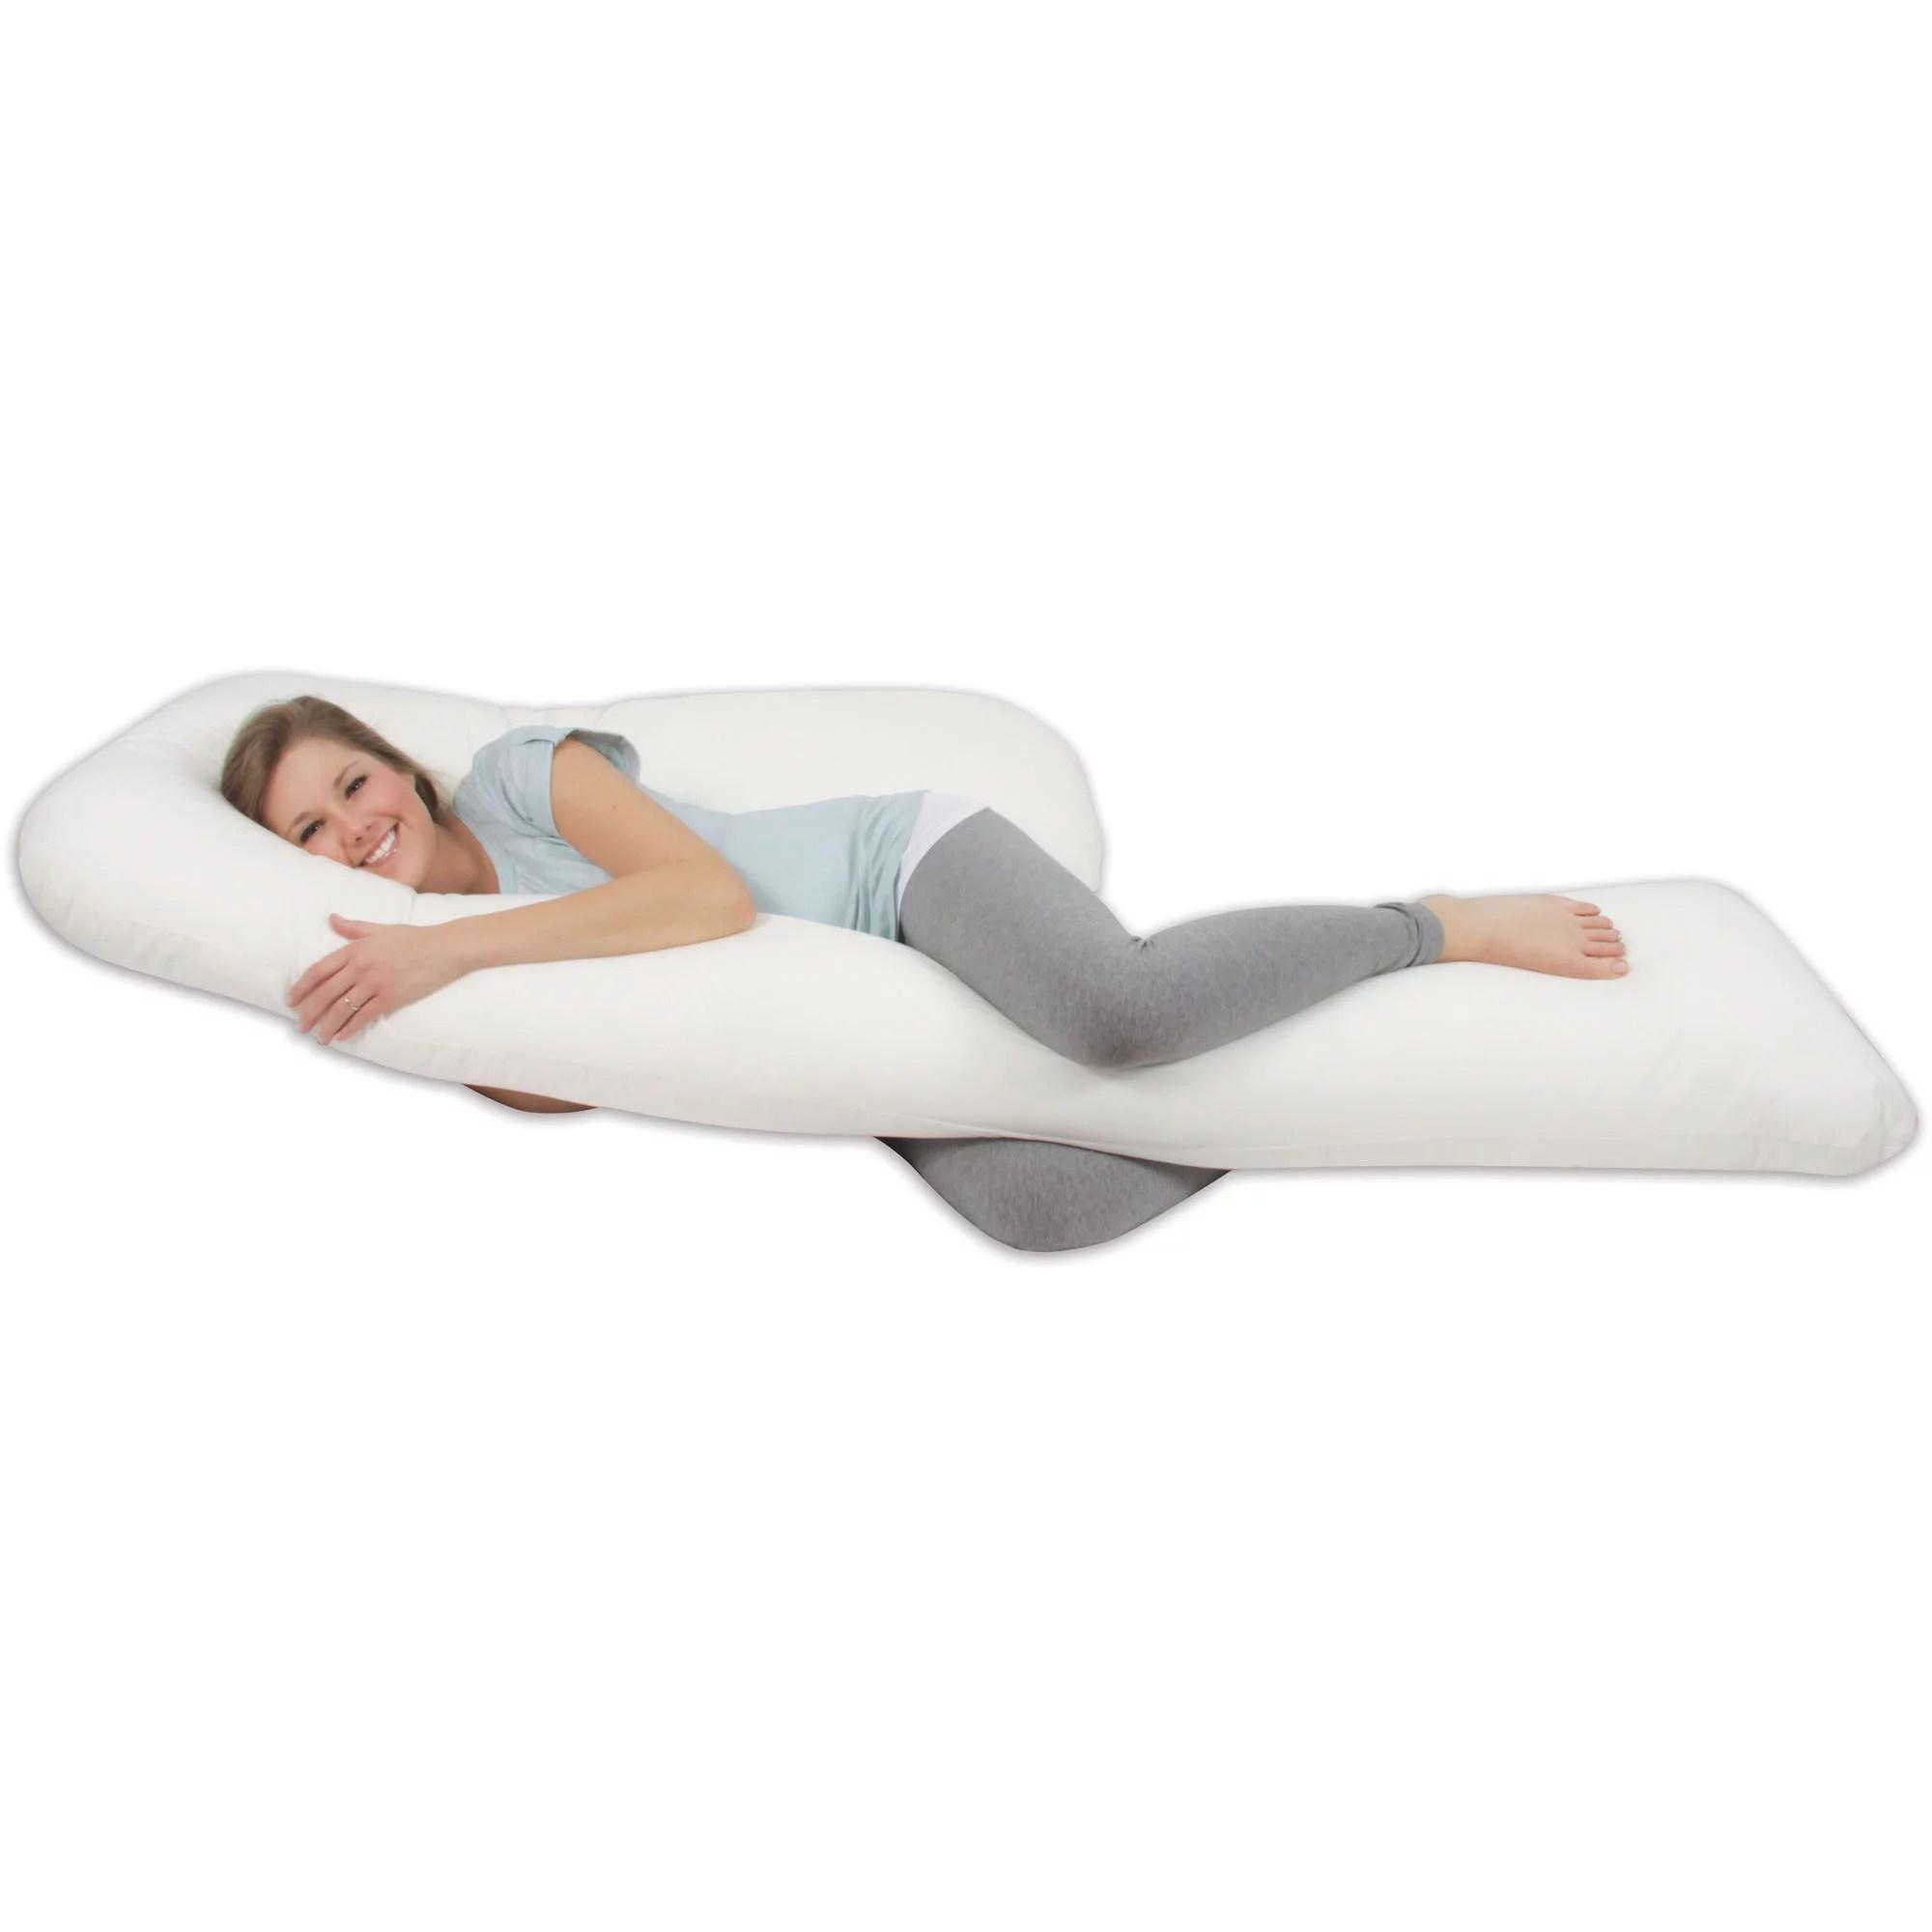 U Shaped Body Pillow Walmart. Pregnancy Pillow Walmart